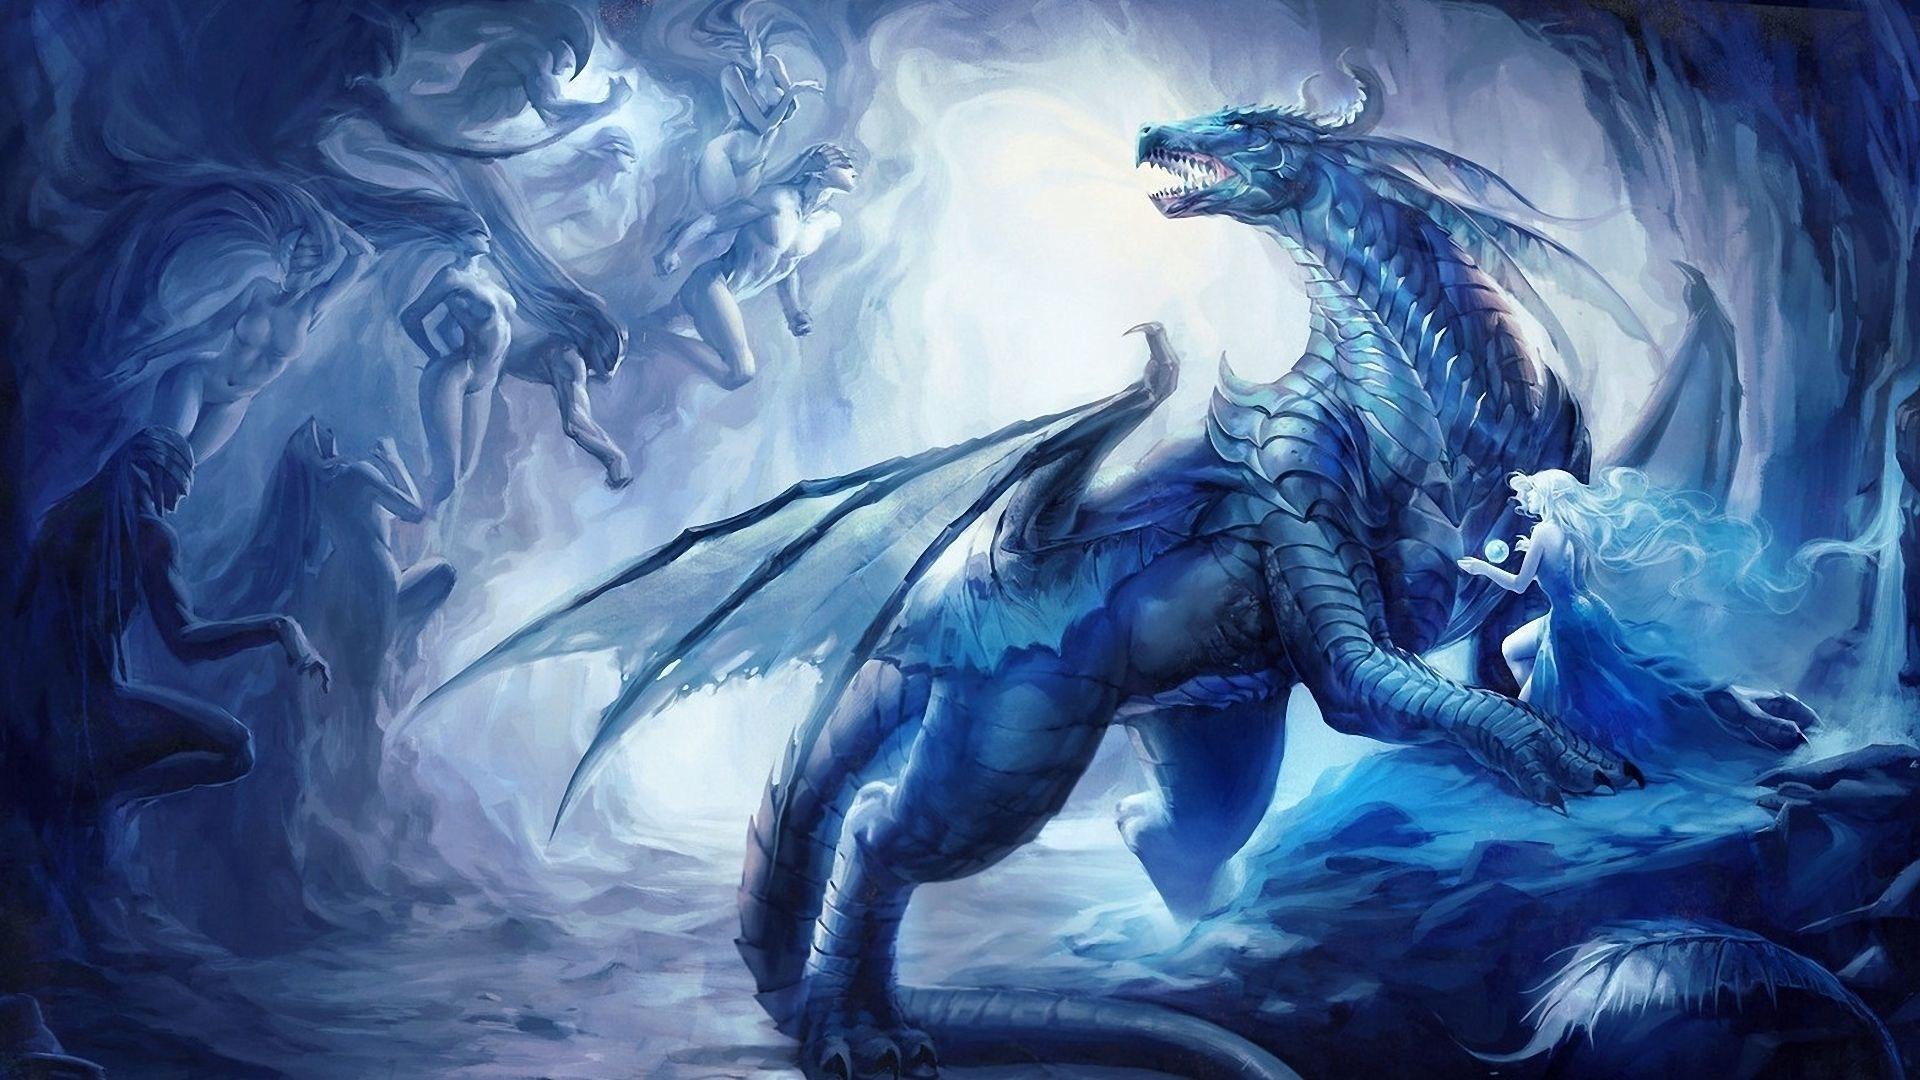 top 50 hd dragon wallpapers, images, backgrounds, desktop wallpapers